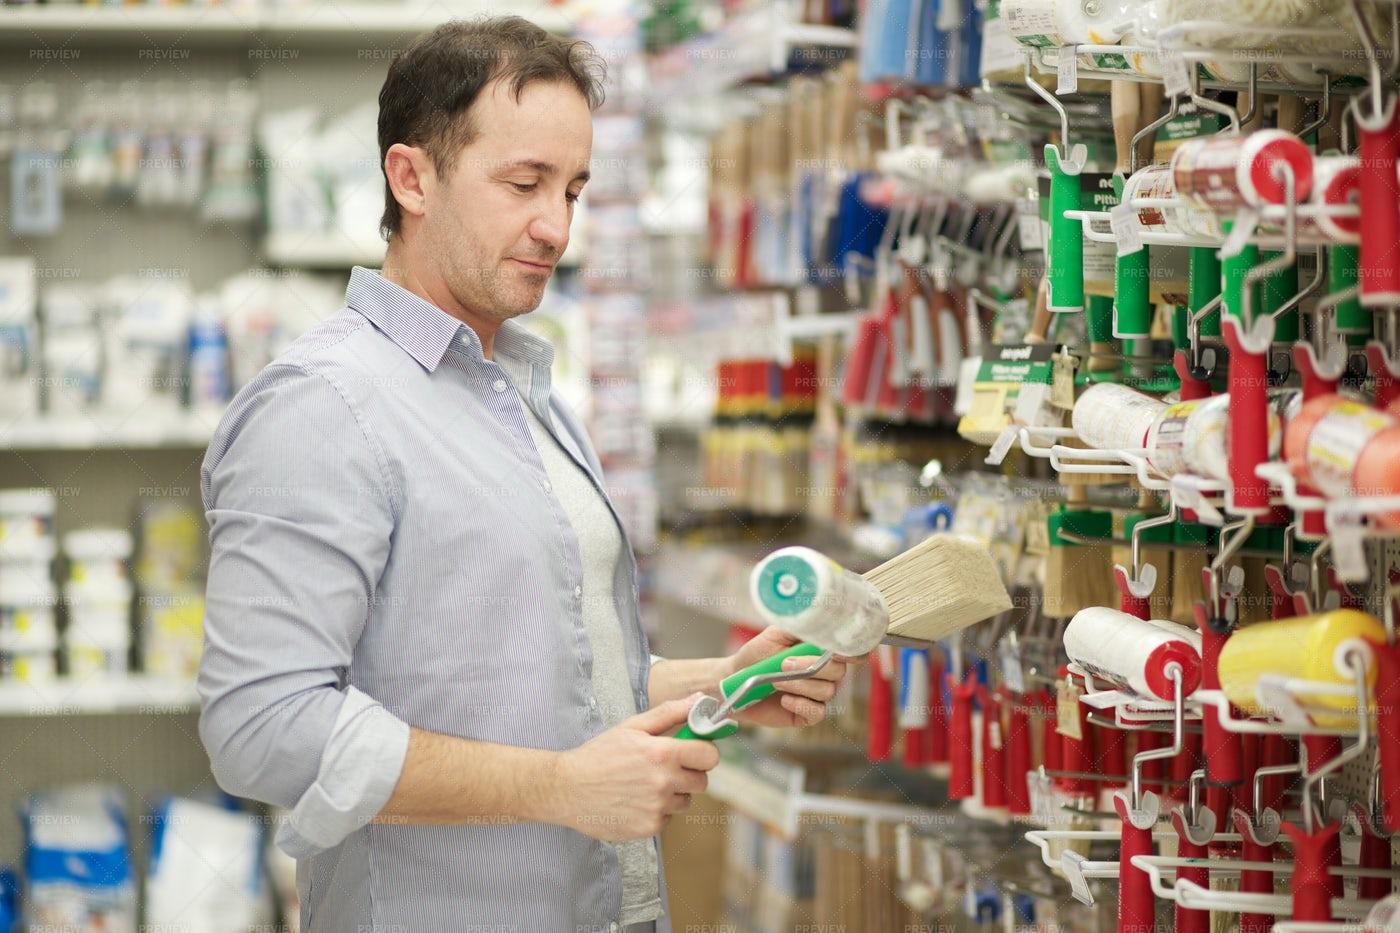 Buying Hardware Supplies: Stock Photos